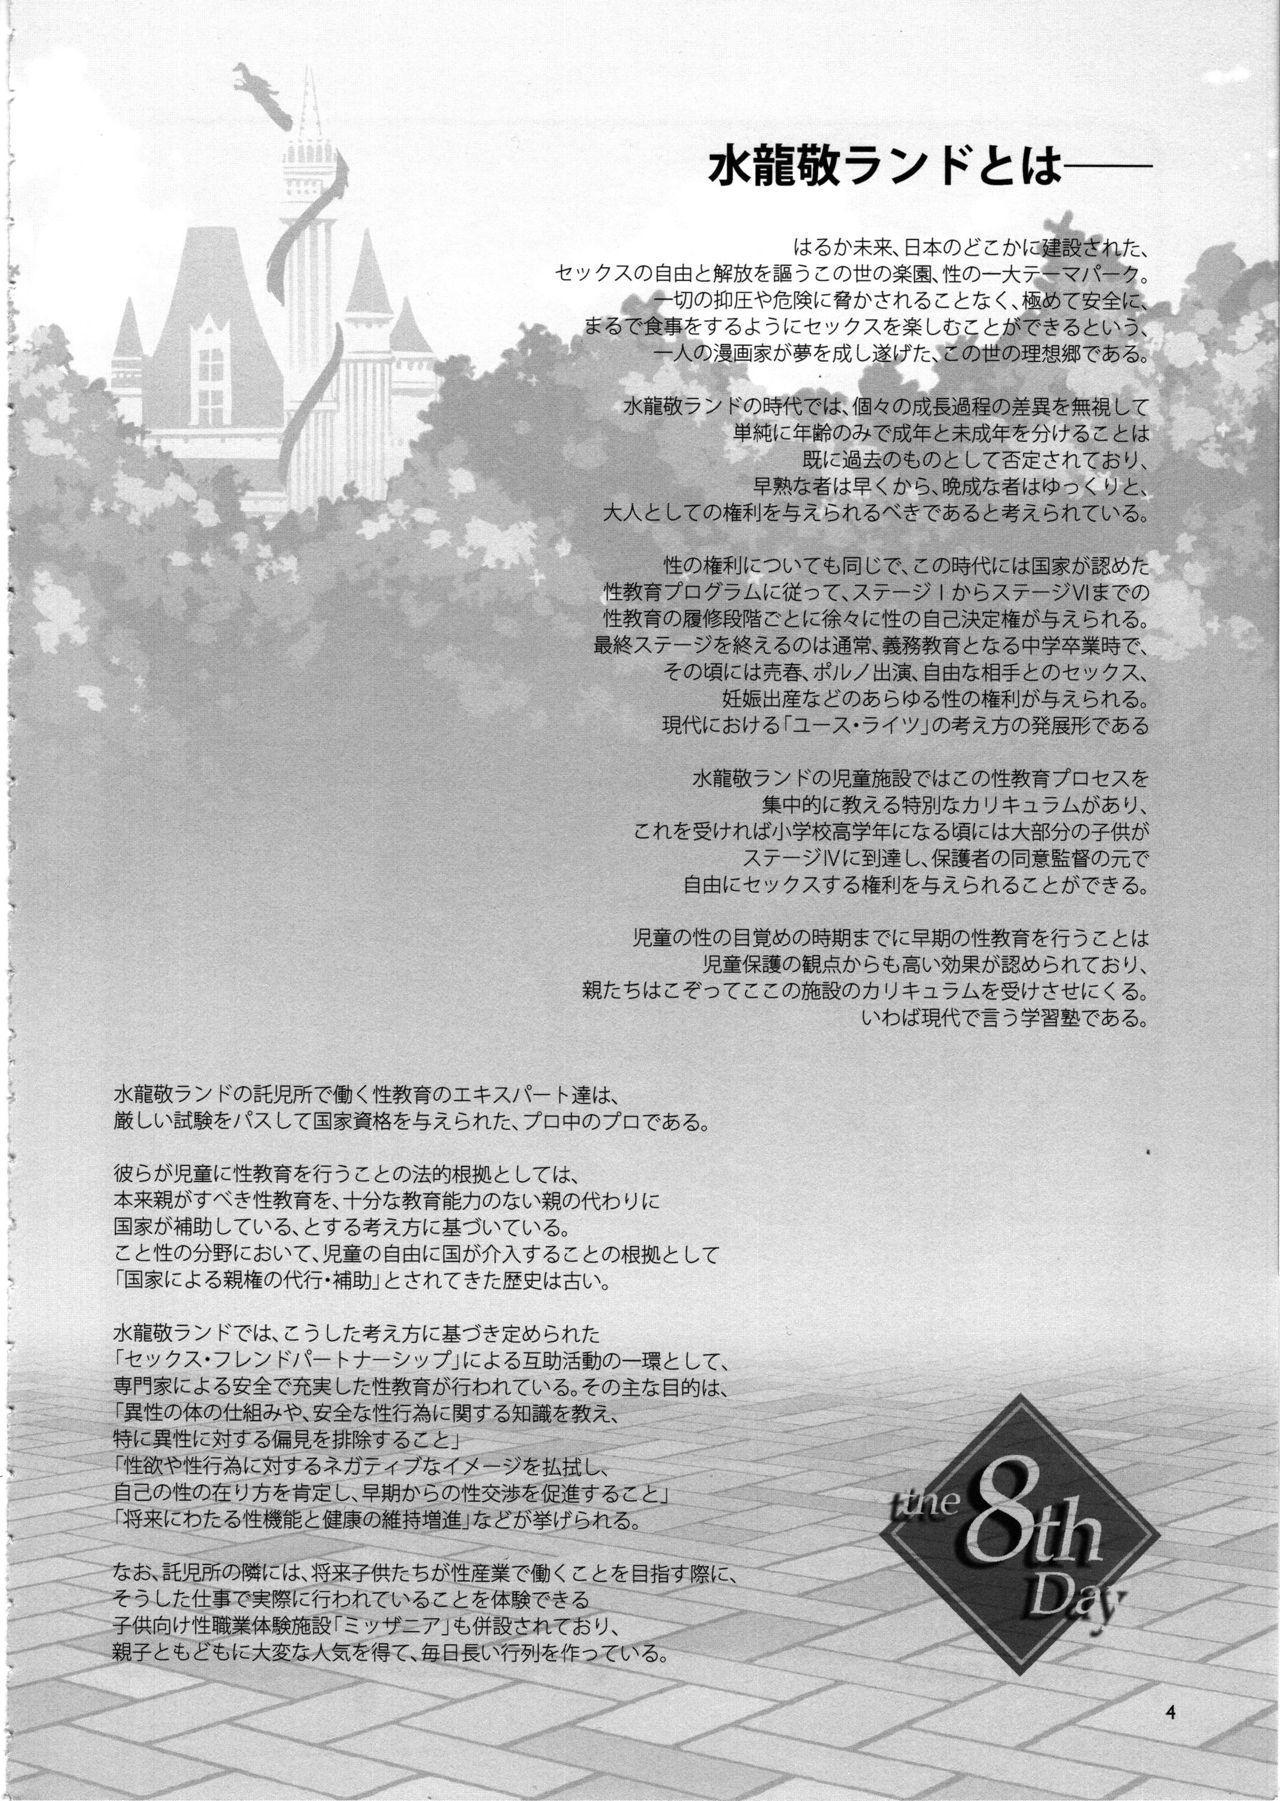 Oideyo! Mizuryu Kei Land the 8th day 2